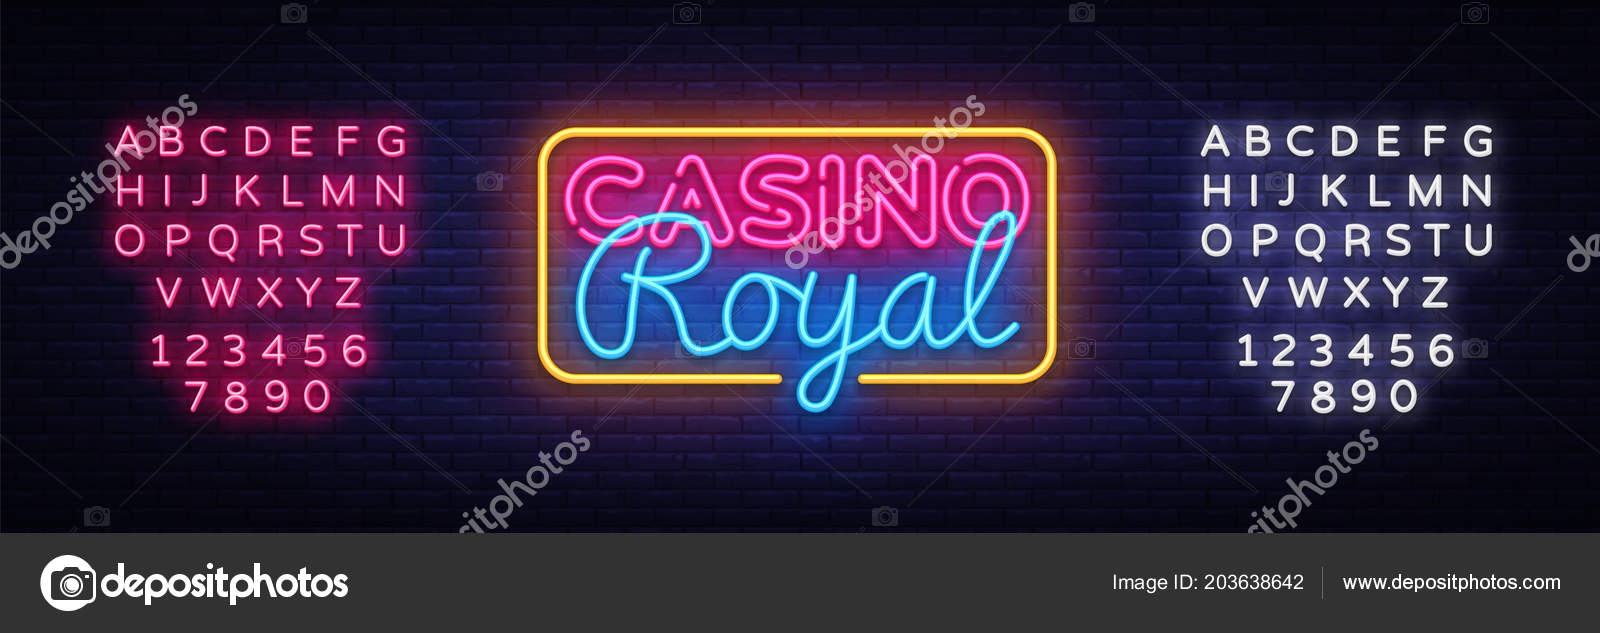 casino royal neon sign vector casino design template neon sign